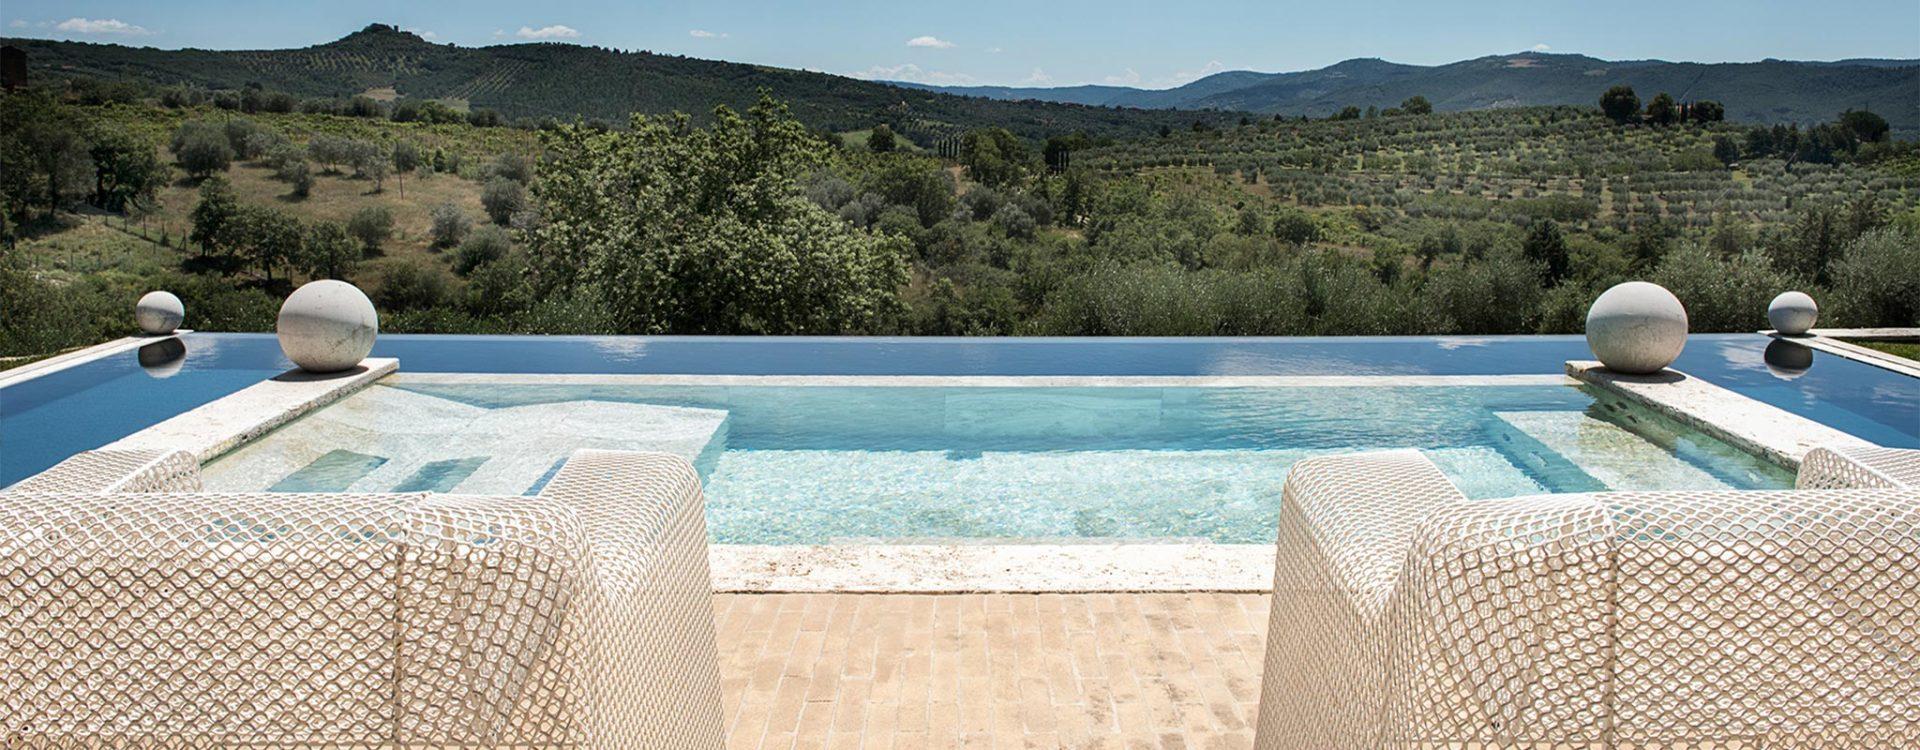 casale_boschetto_properties_sale_umbria_subheader